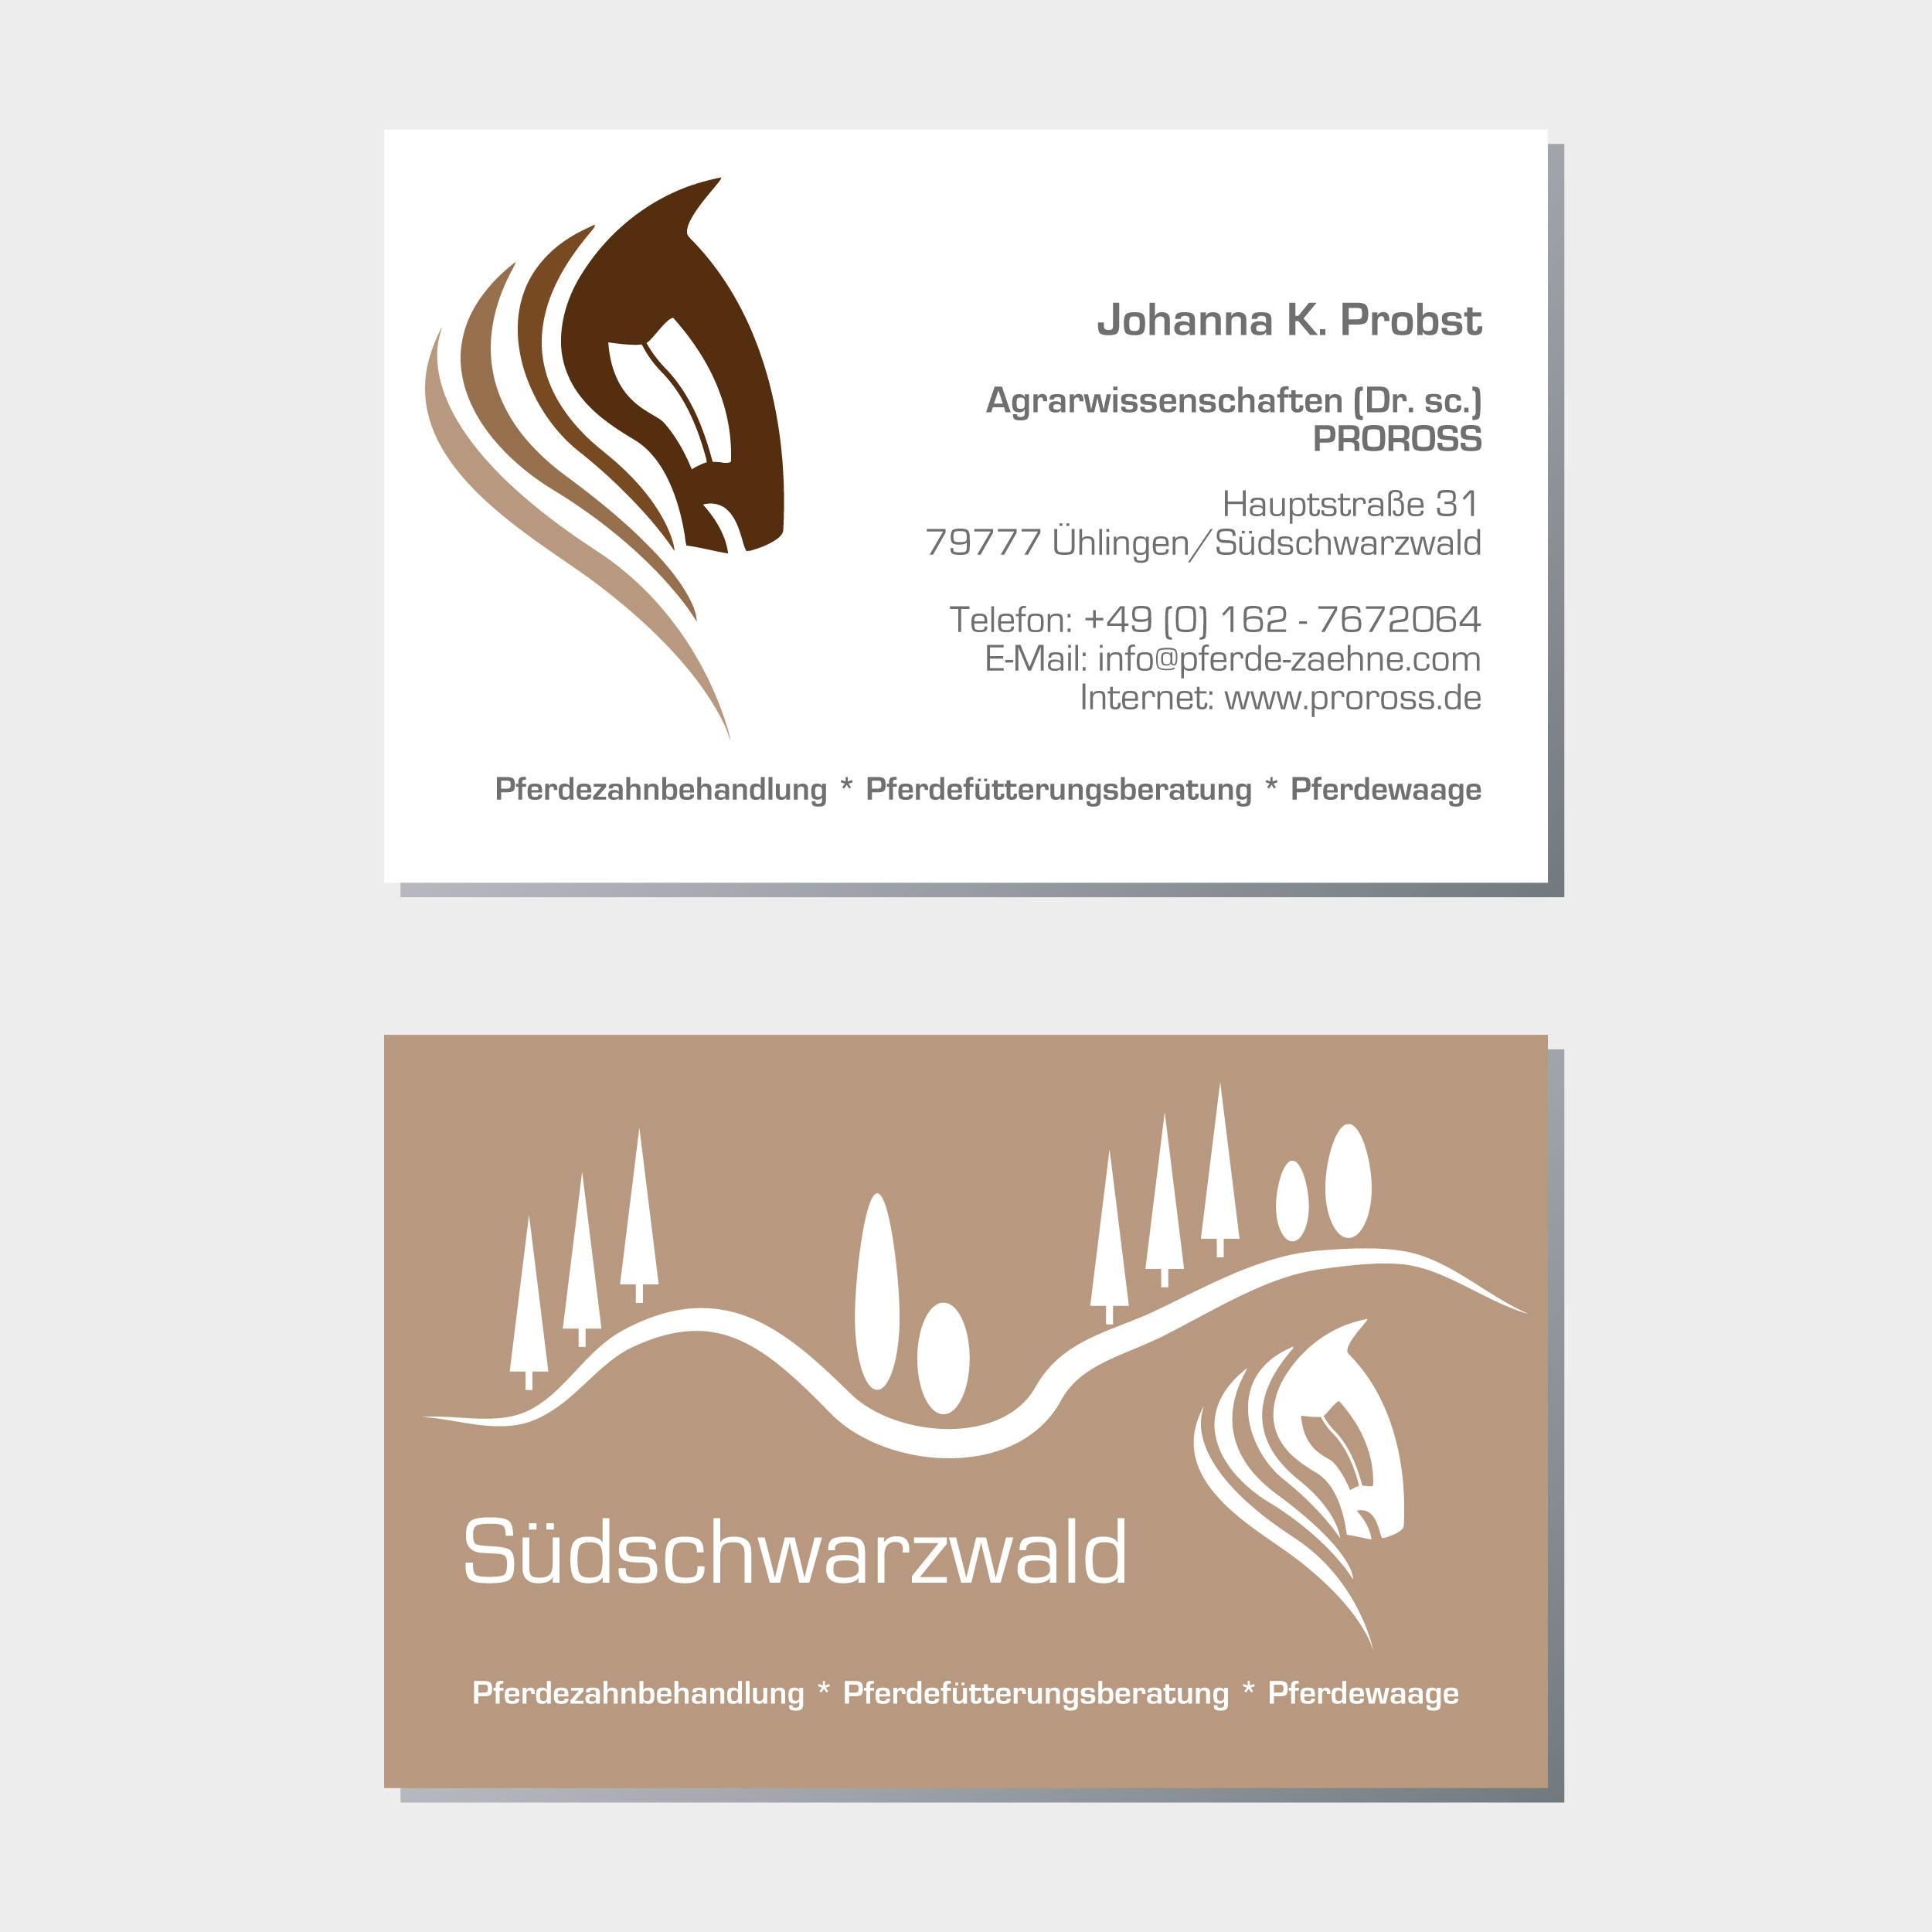 design #22 of logotyp